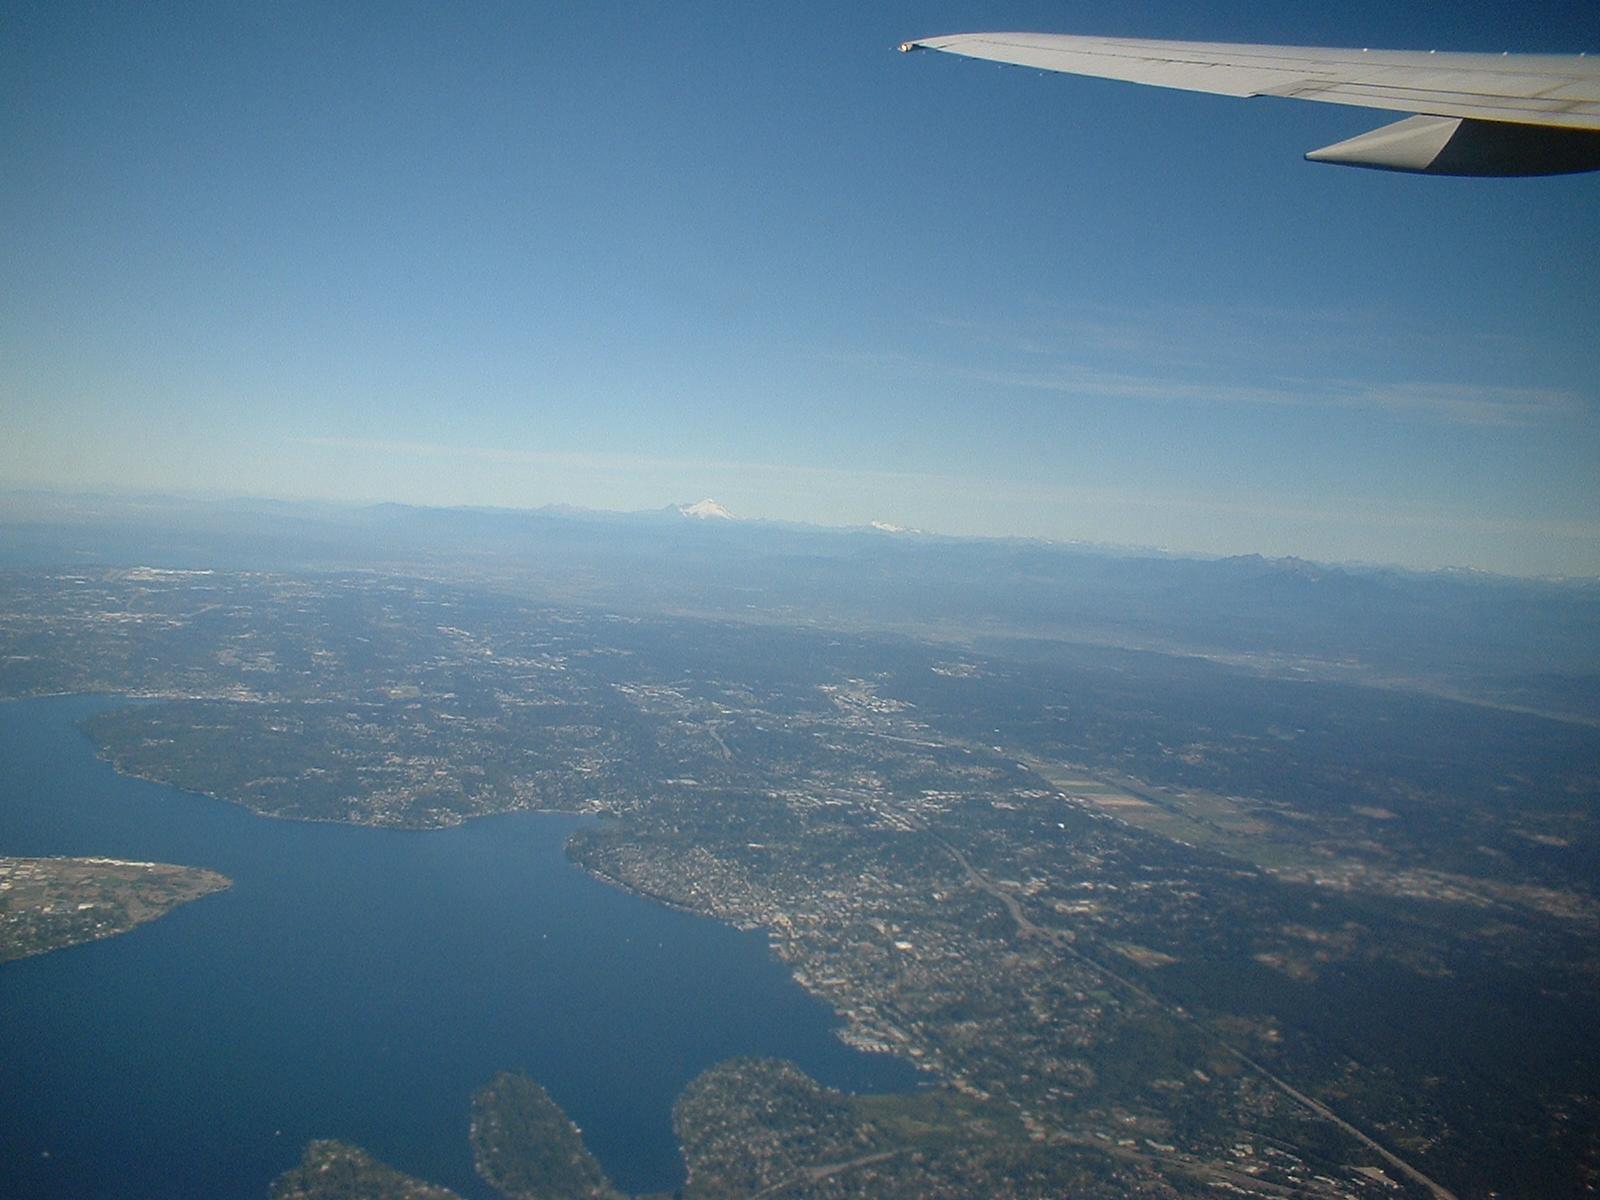 Travel by air photo